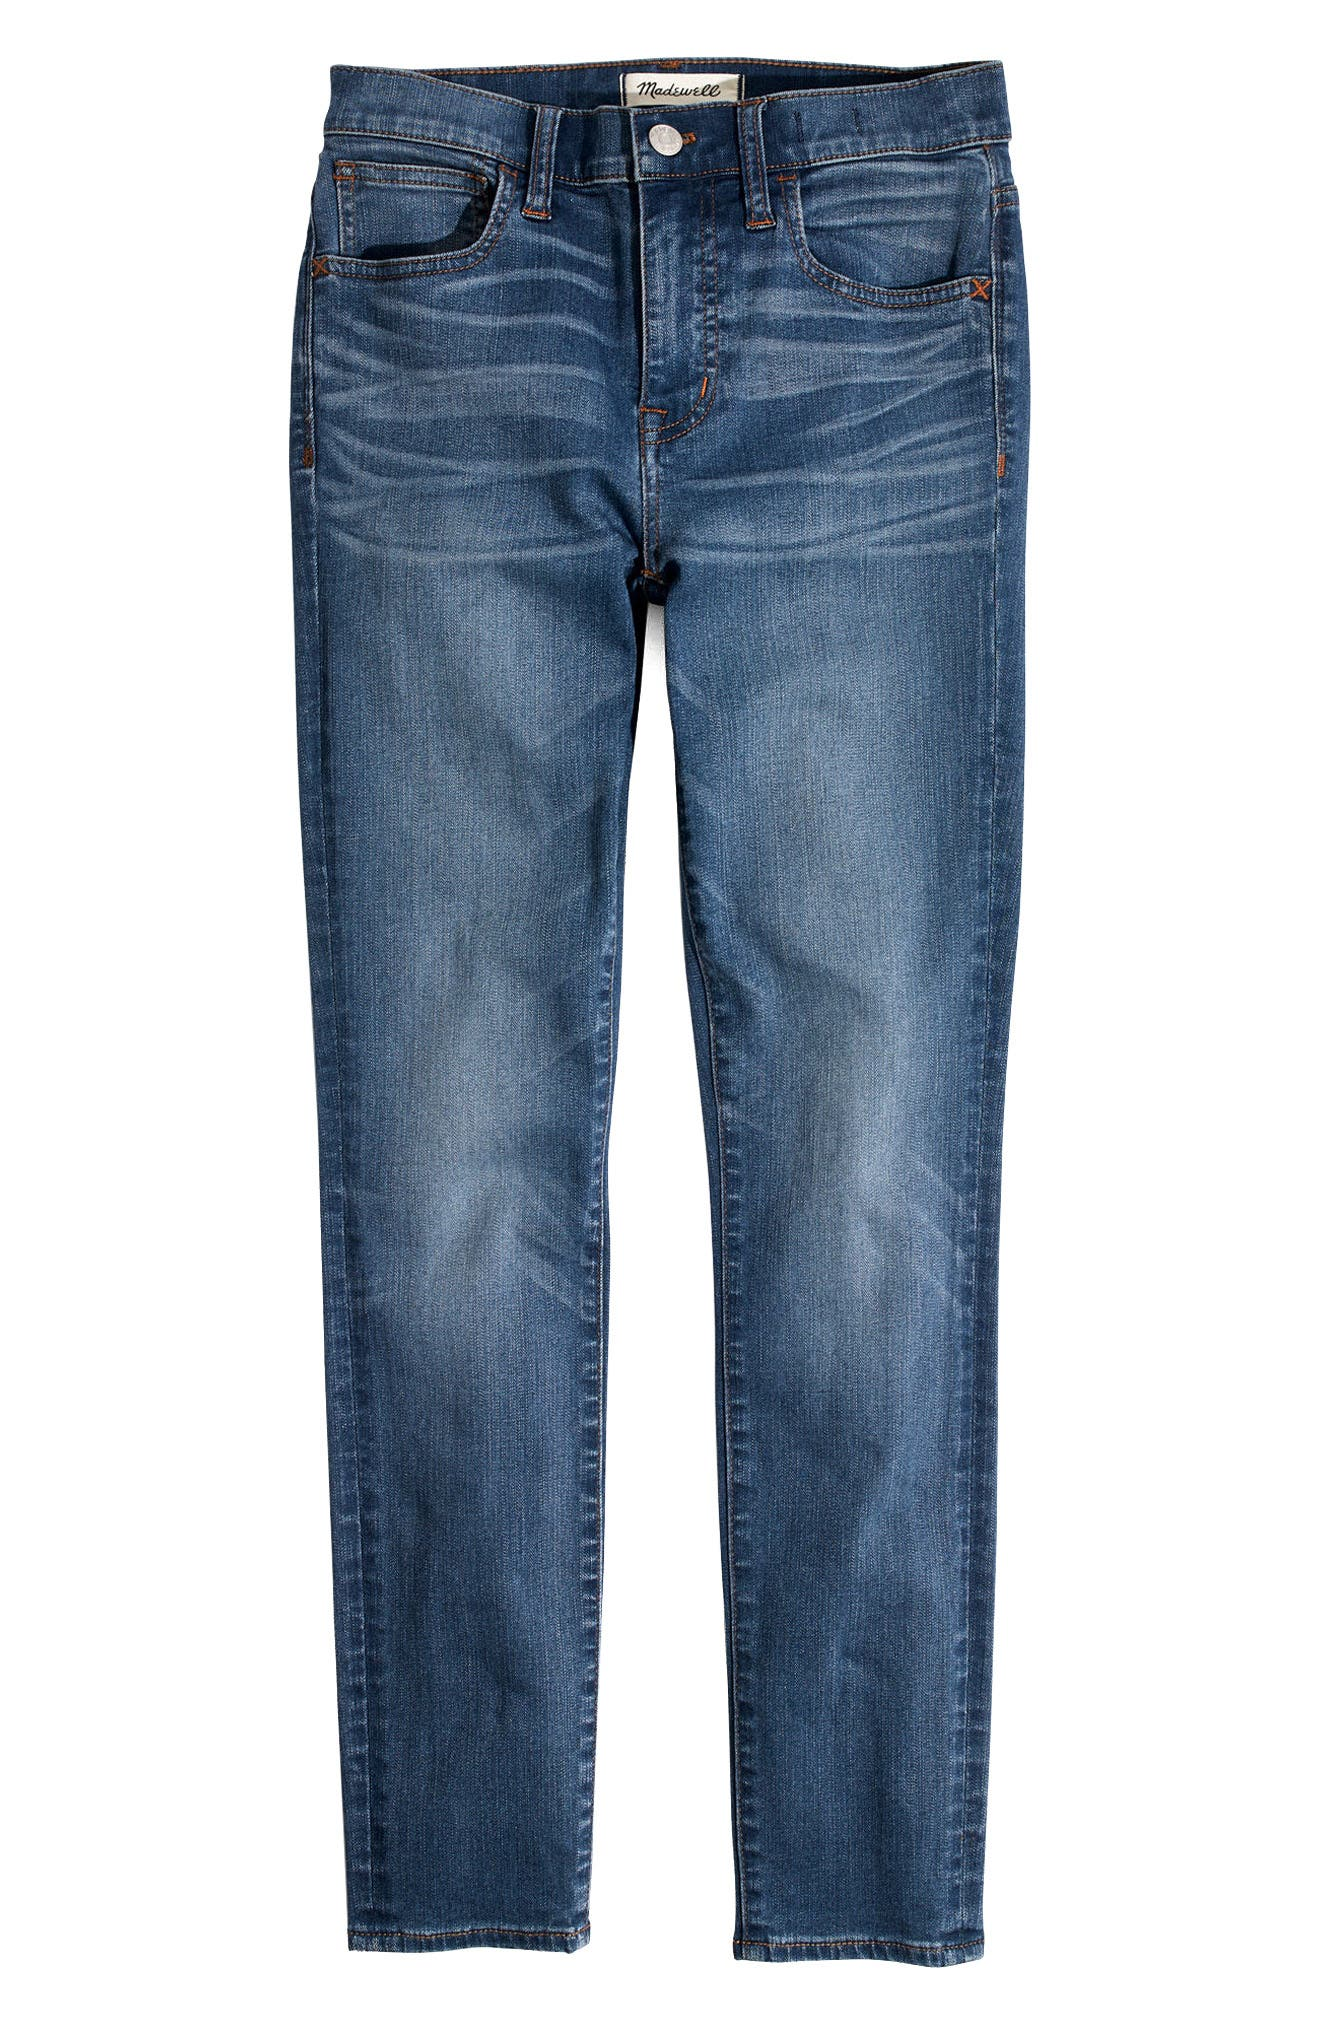 Roadtripper Crop Skinny Jeans,                             Alternate thumbnail 4, color,                             Declan Wash